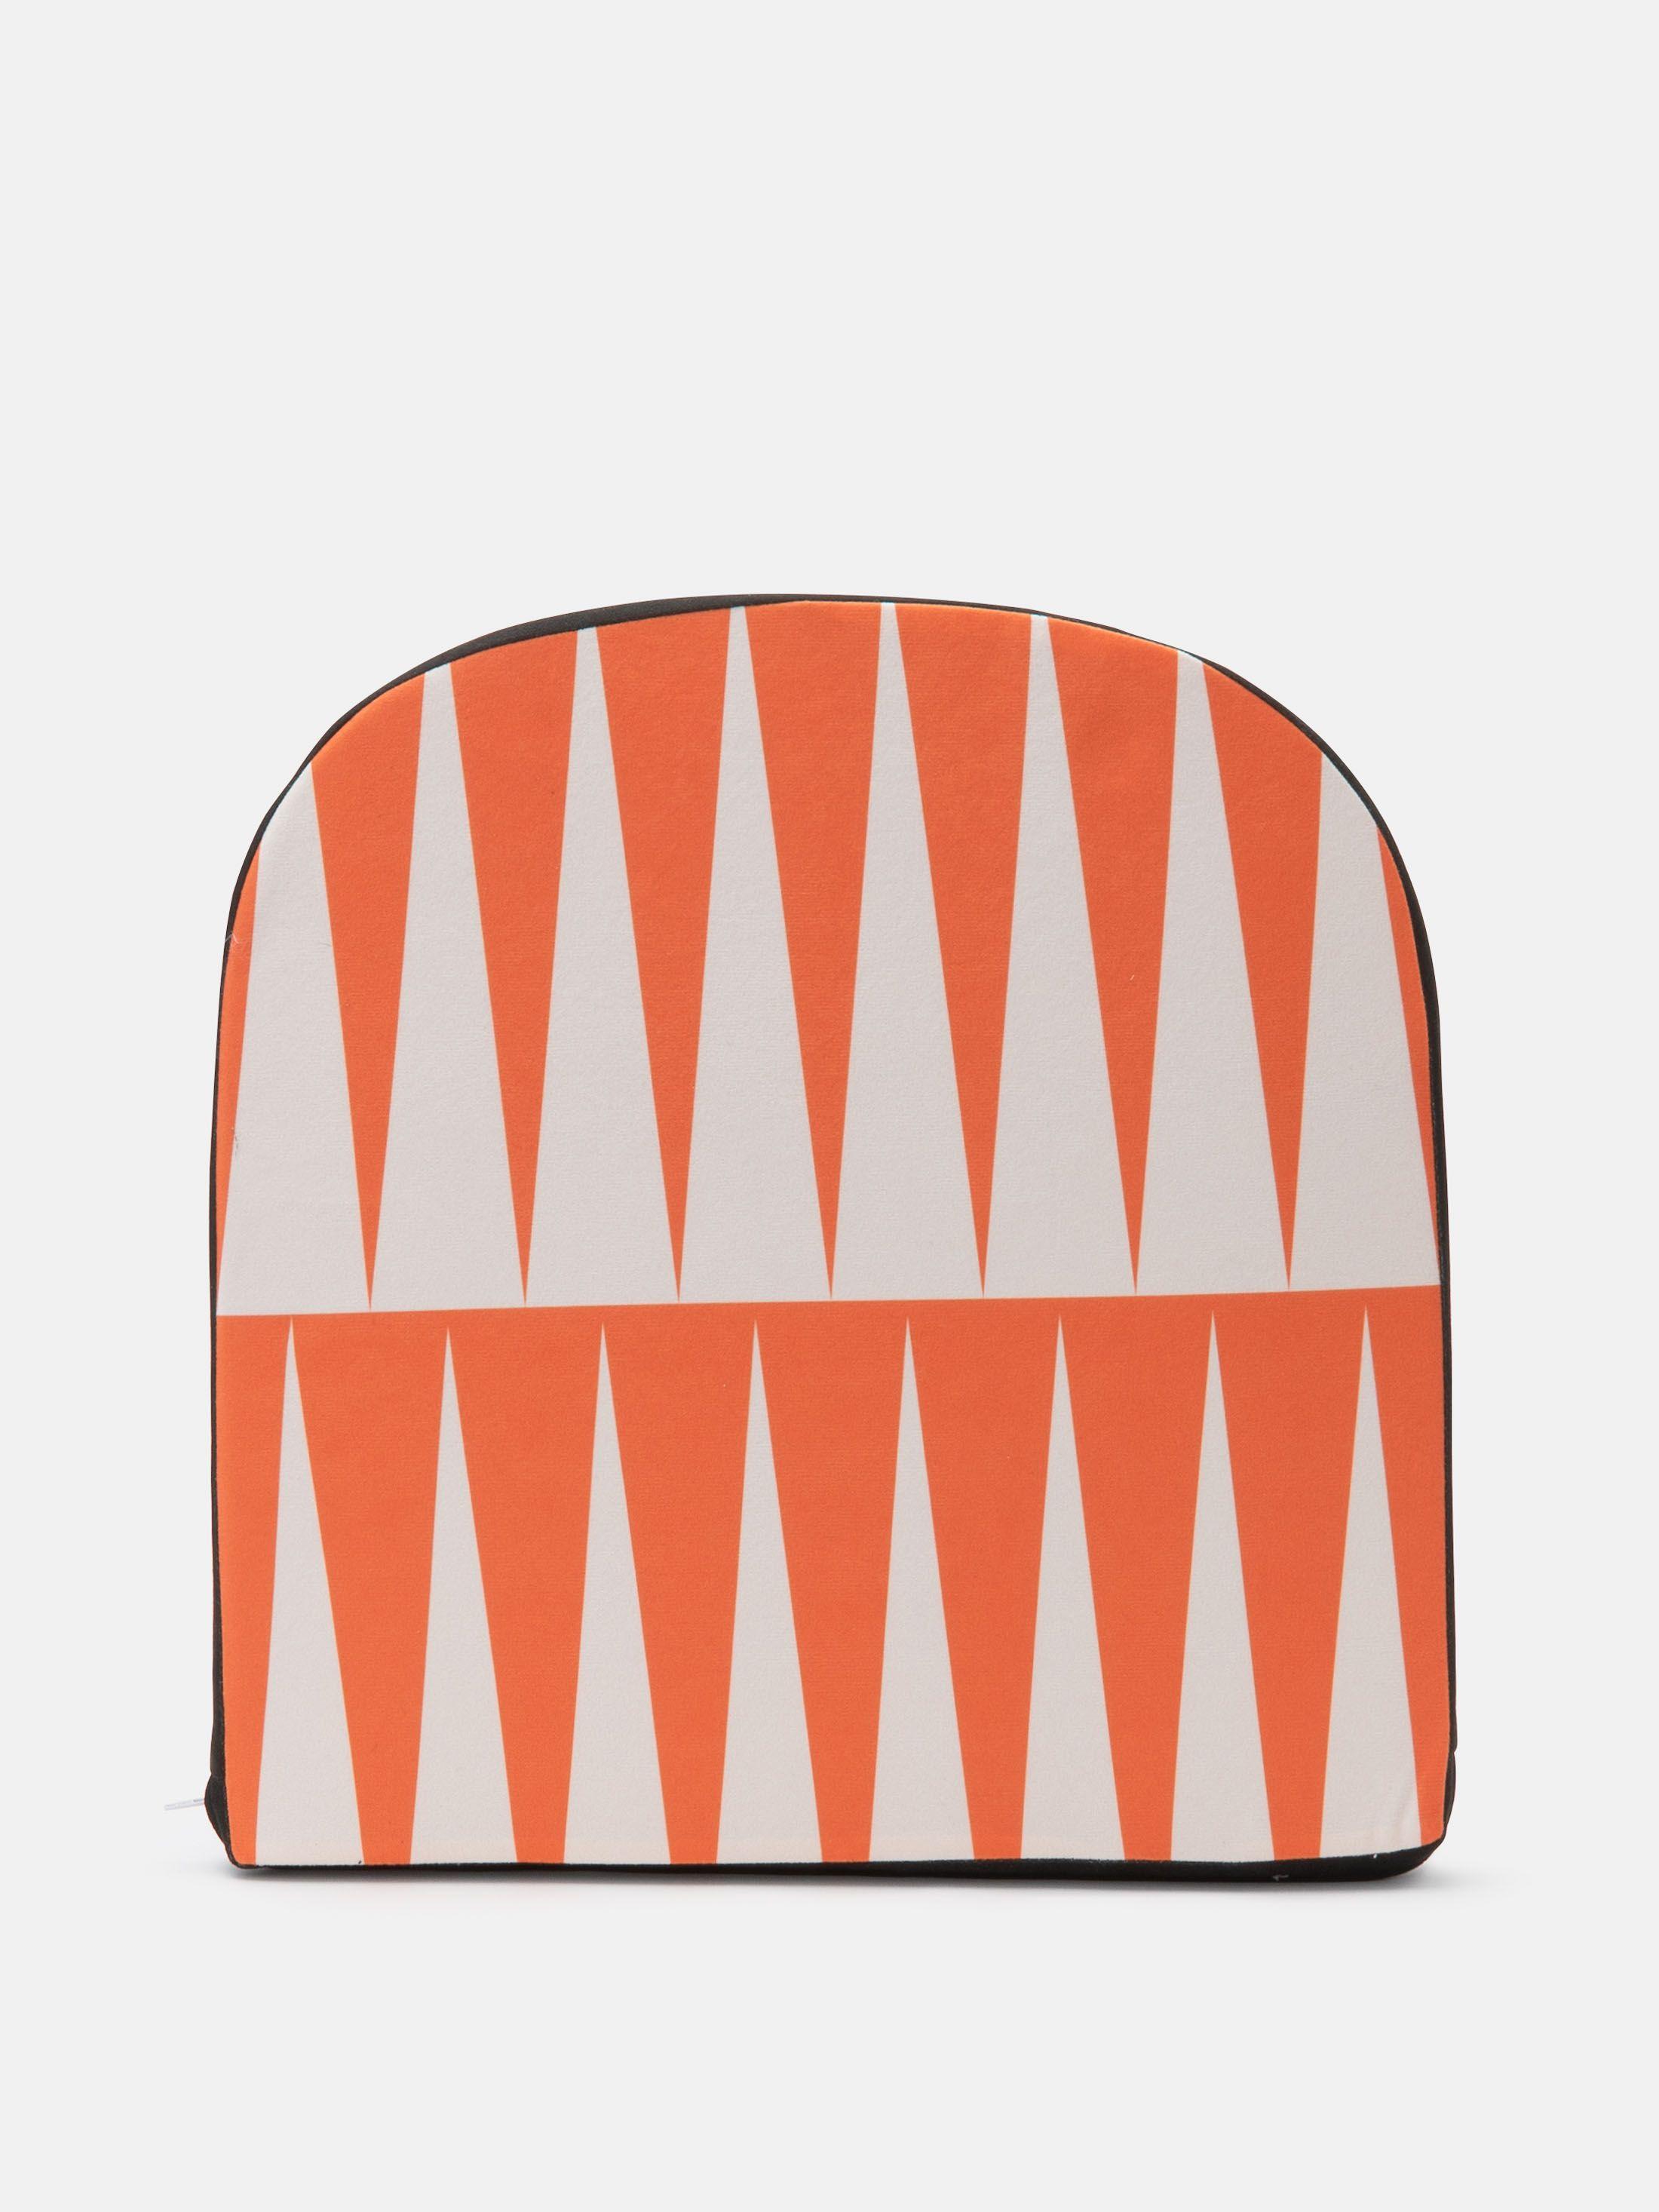 custom seat cushions for chairs